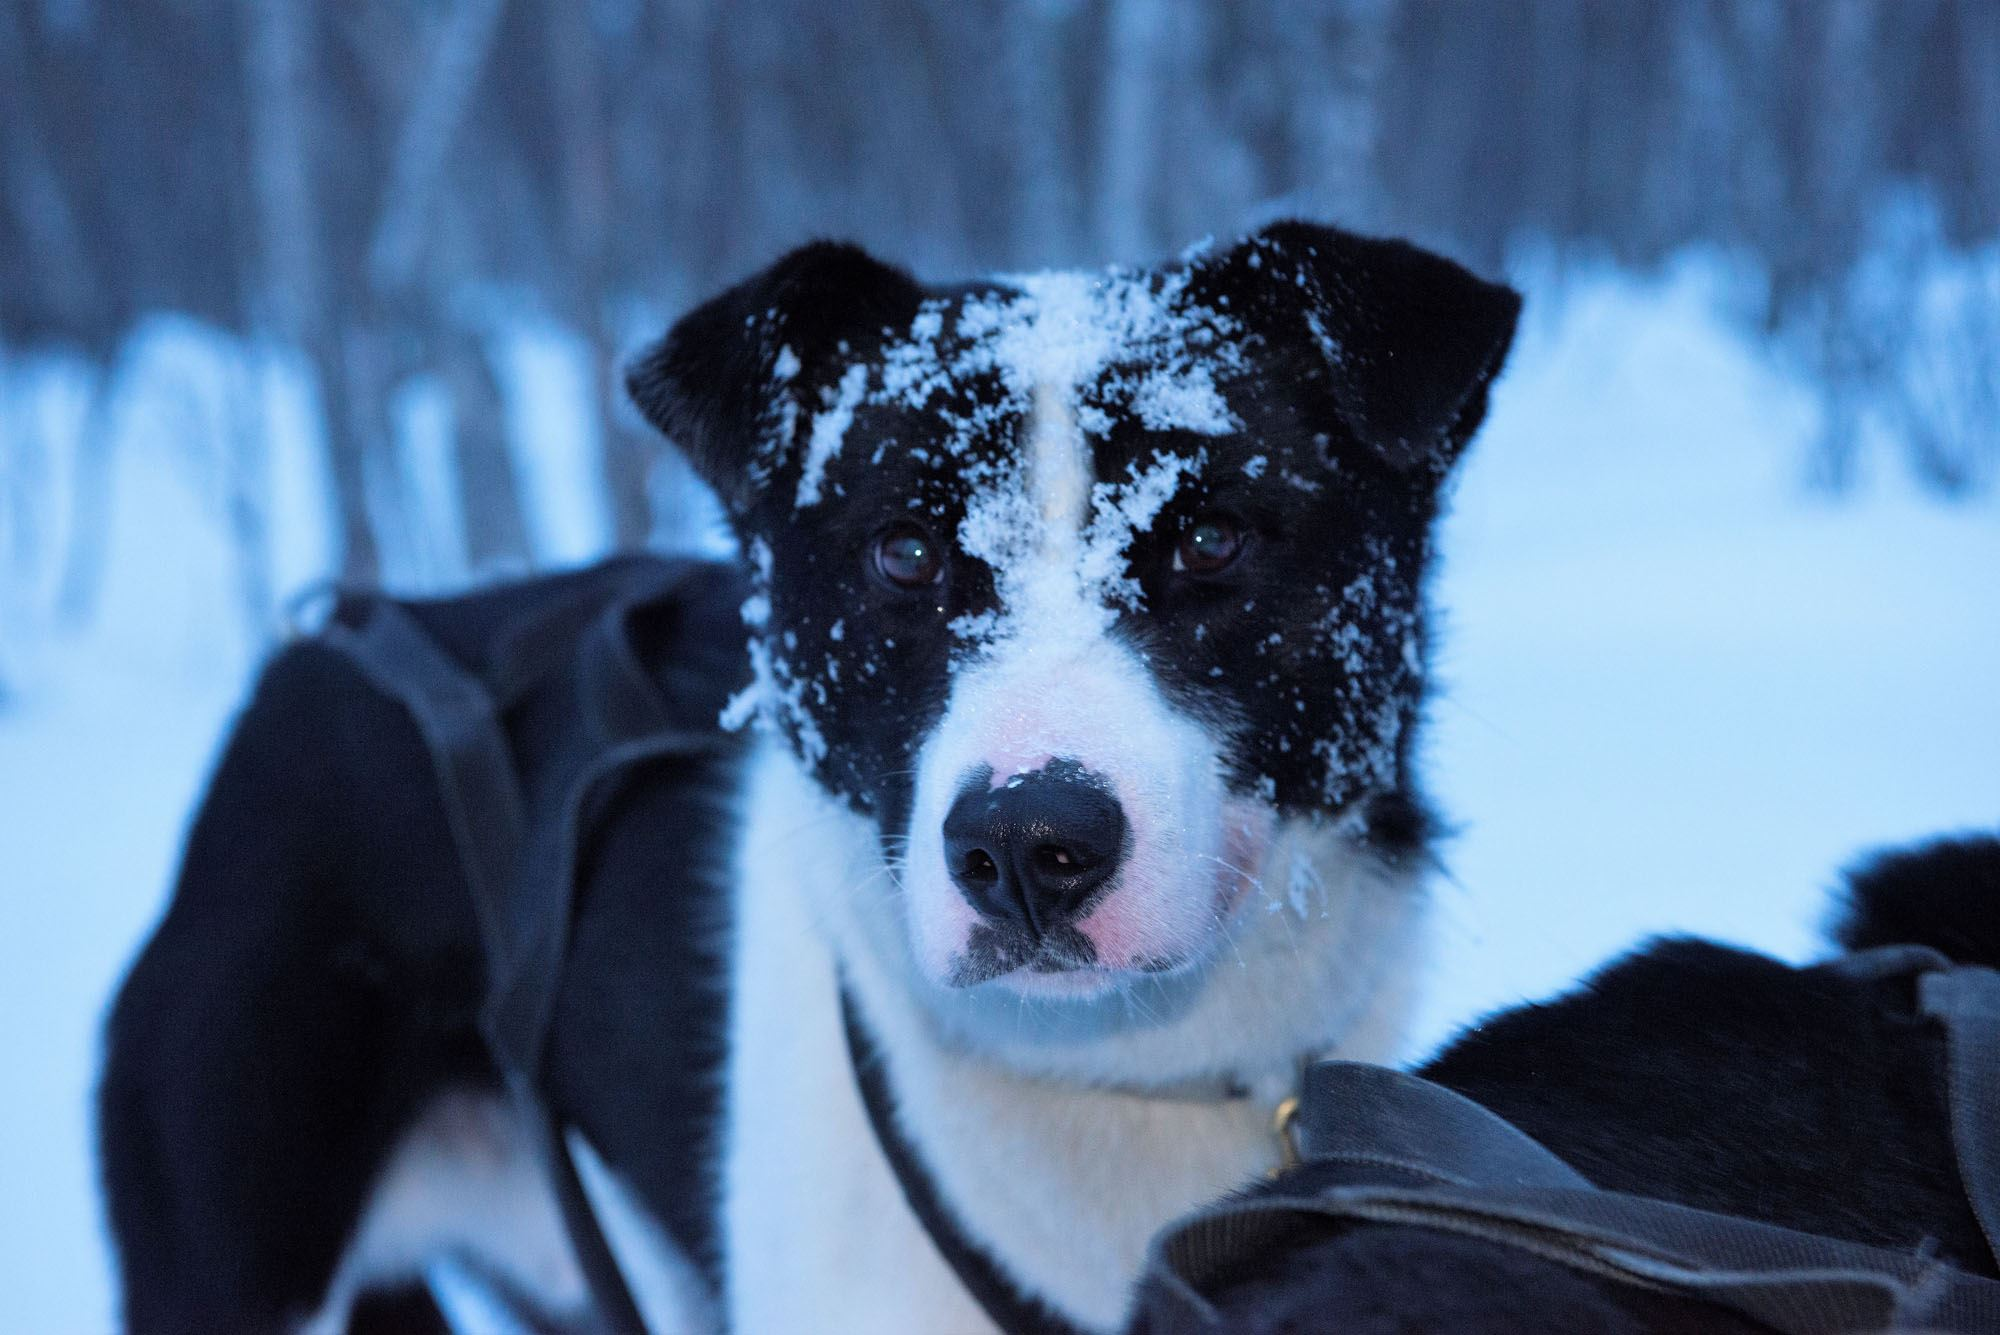 © Mira Hampel, Dog sledding in Røyeldalen / Reisadalen